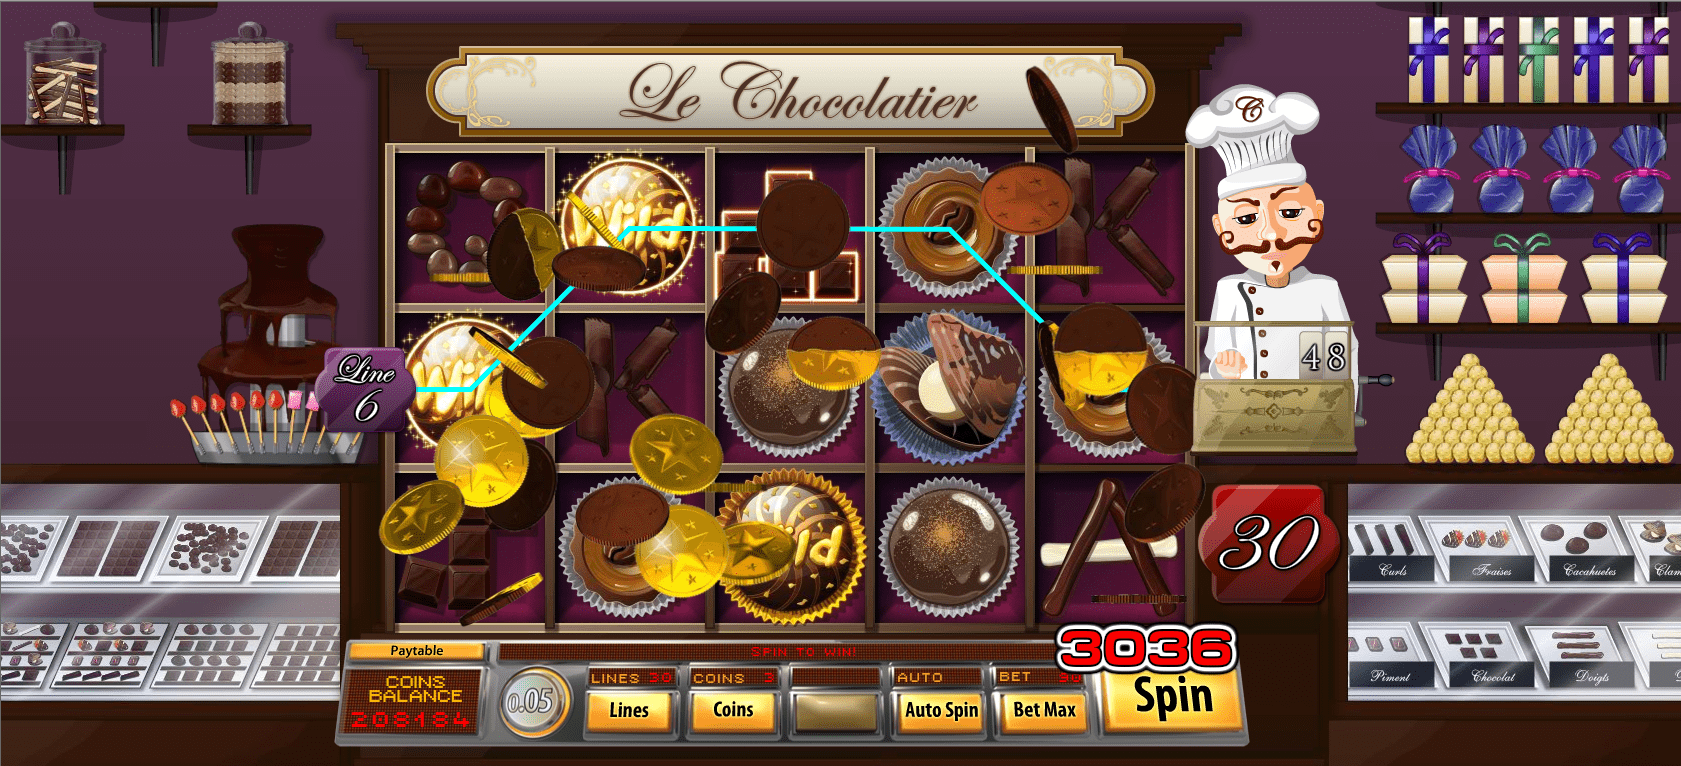 Le Chocolatier Slot Game